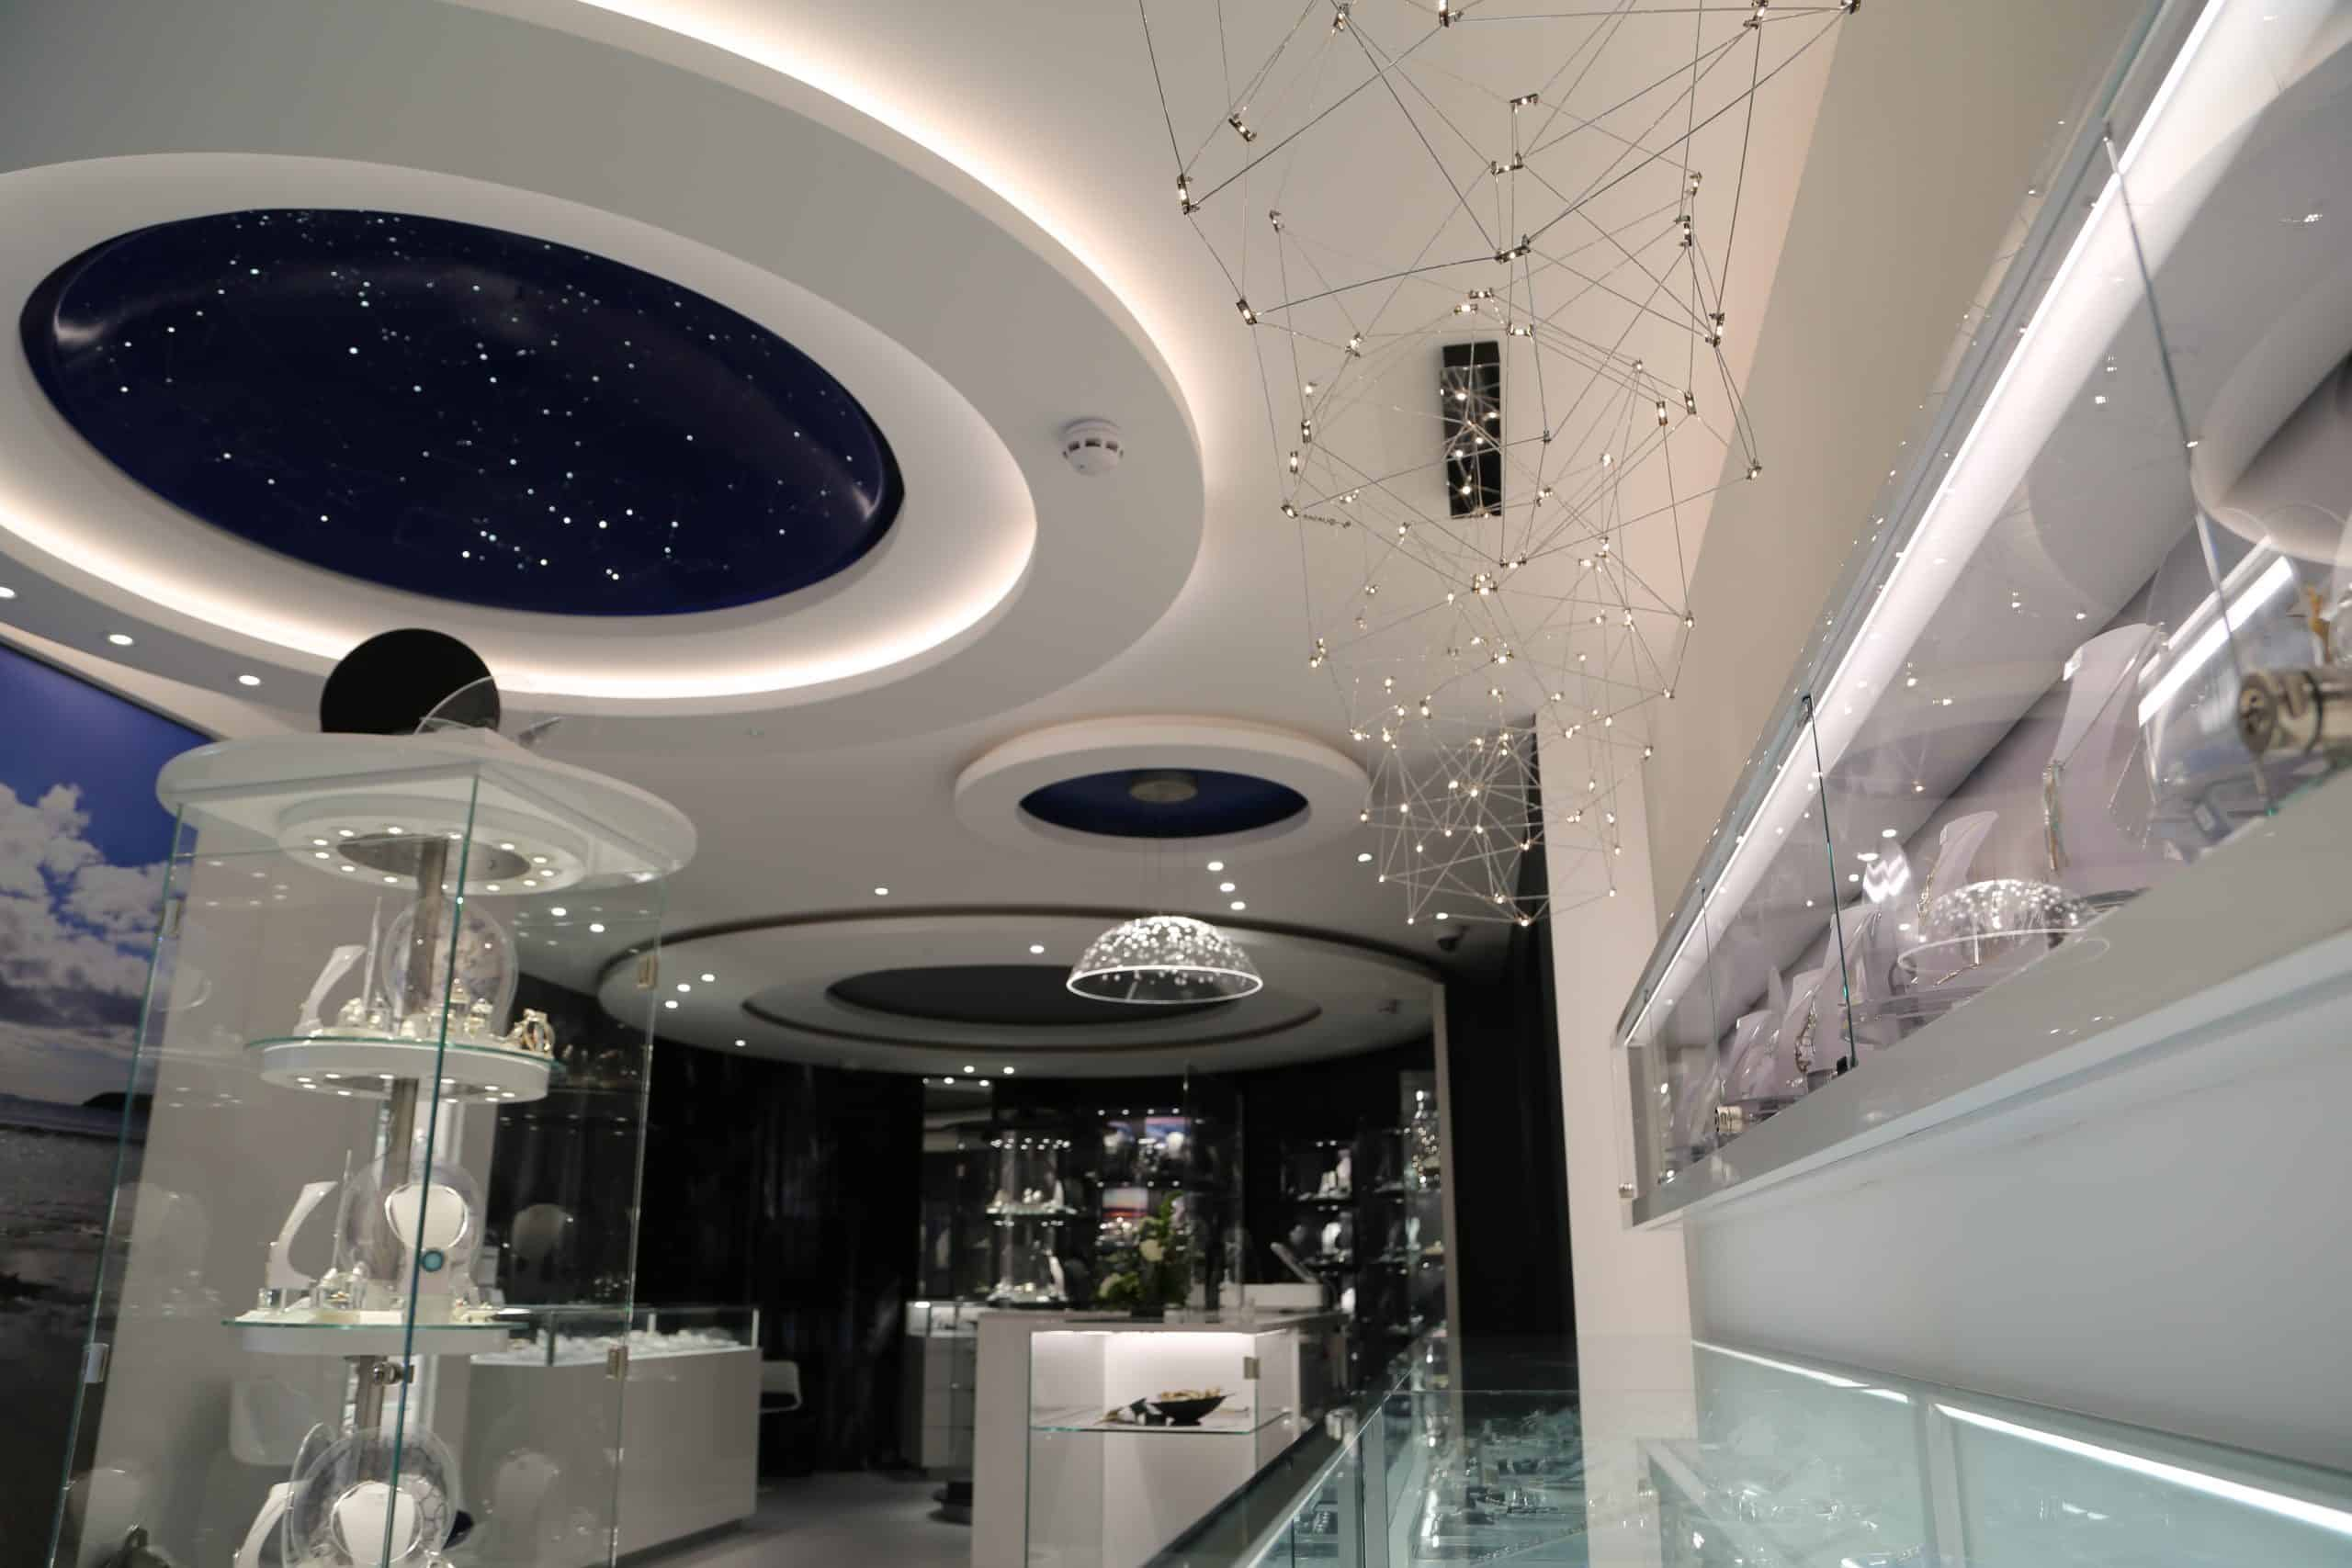 Orkney jewellery designer Sheila Fleet opens gallery in St Andrews